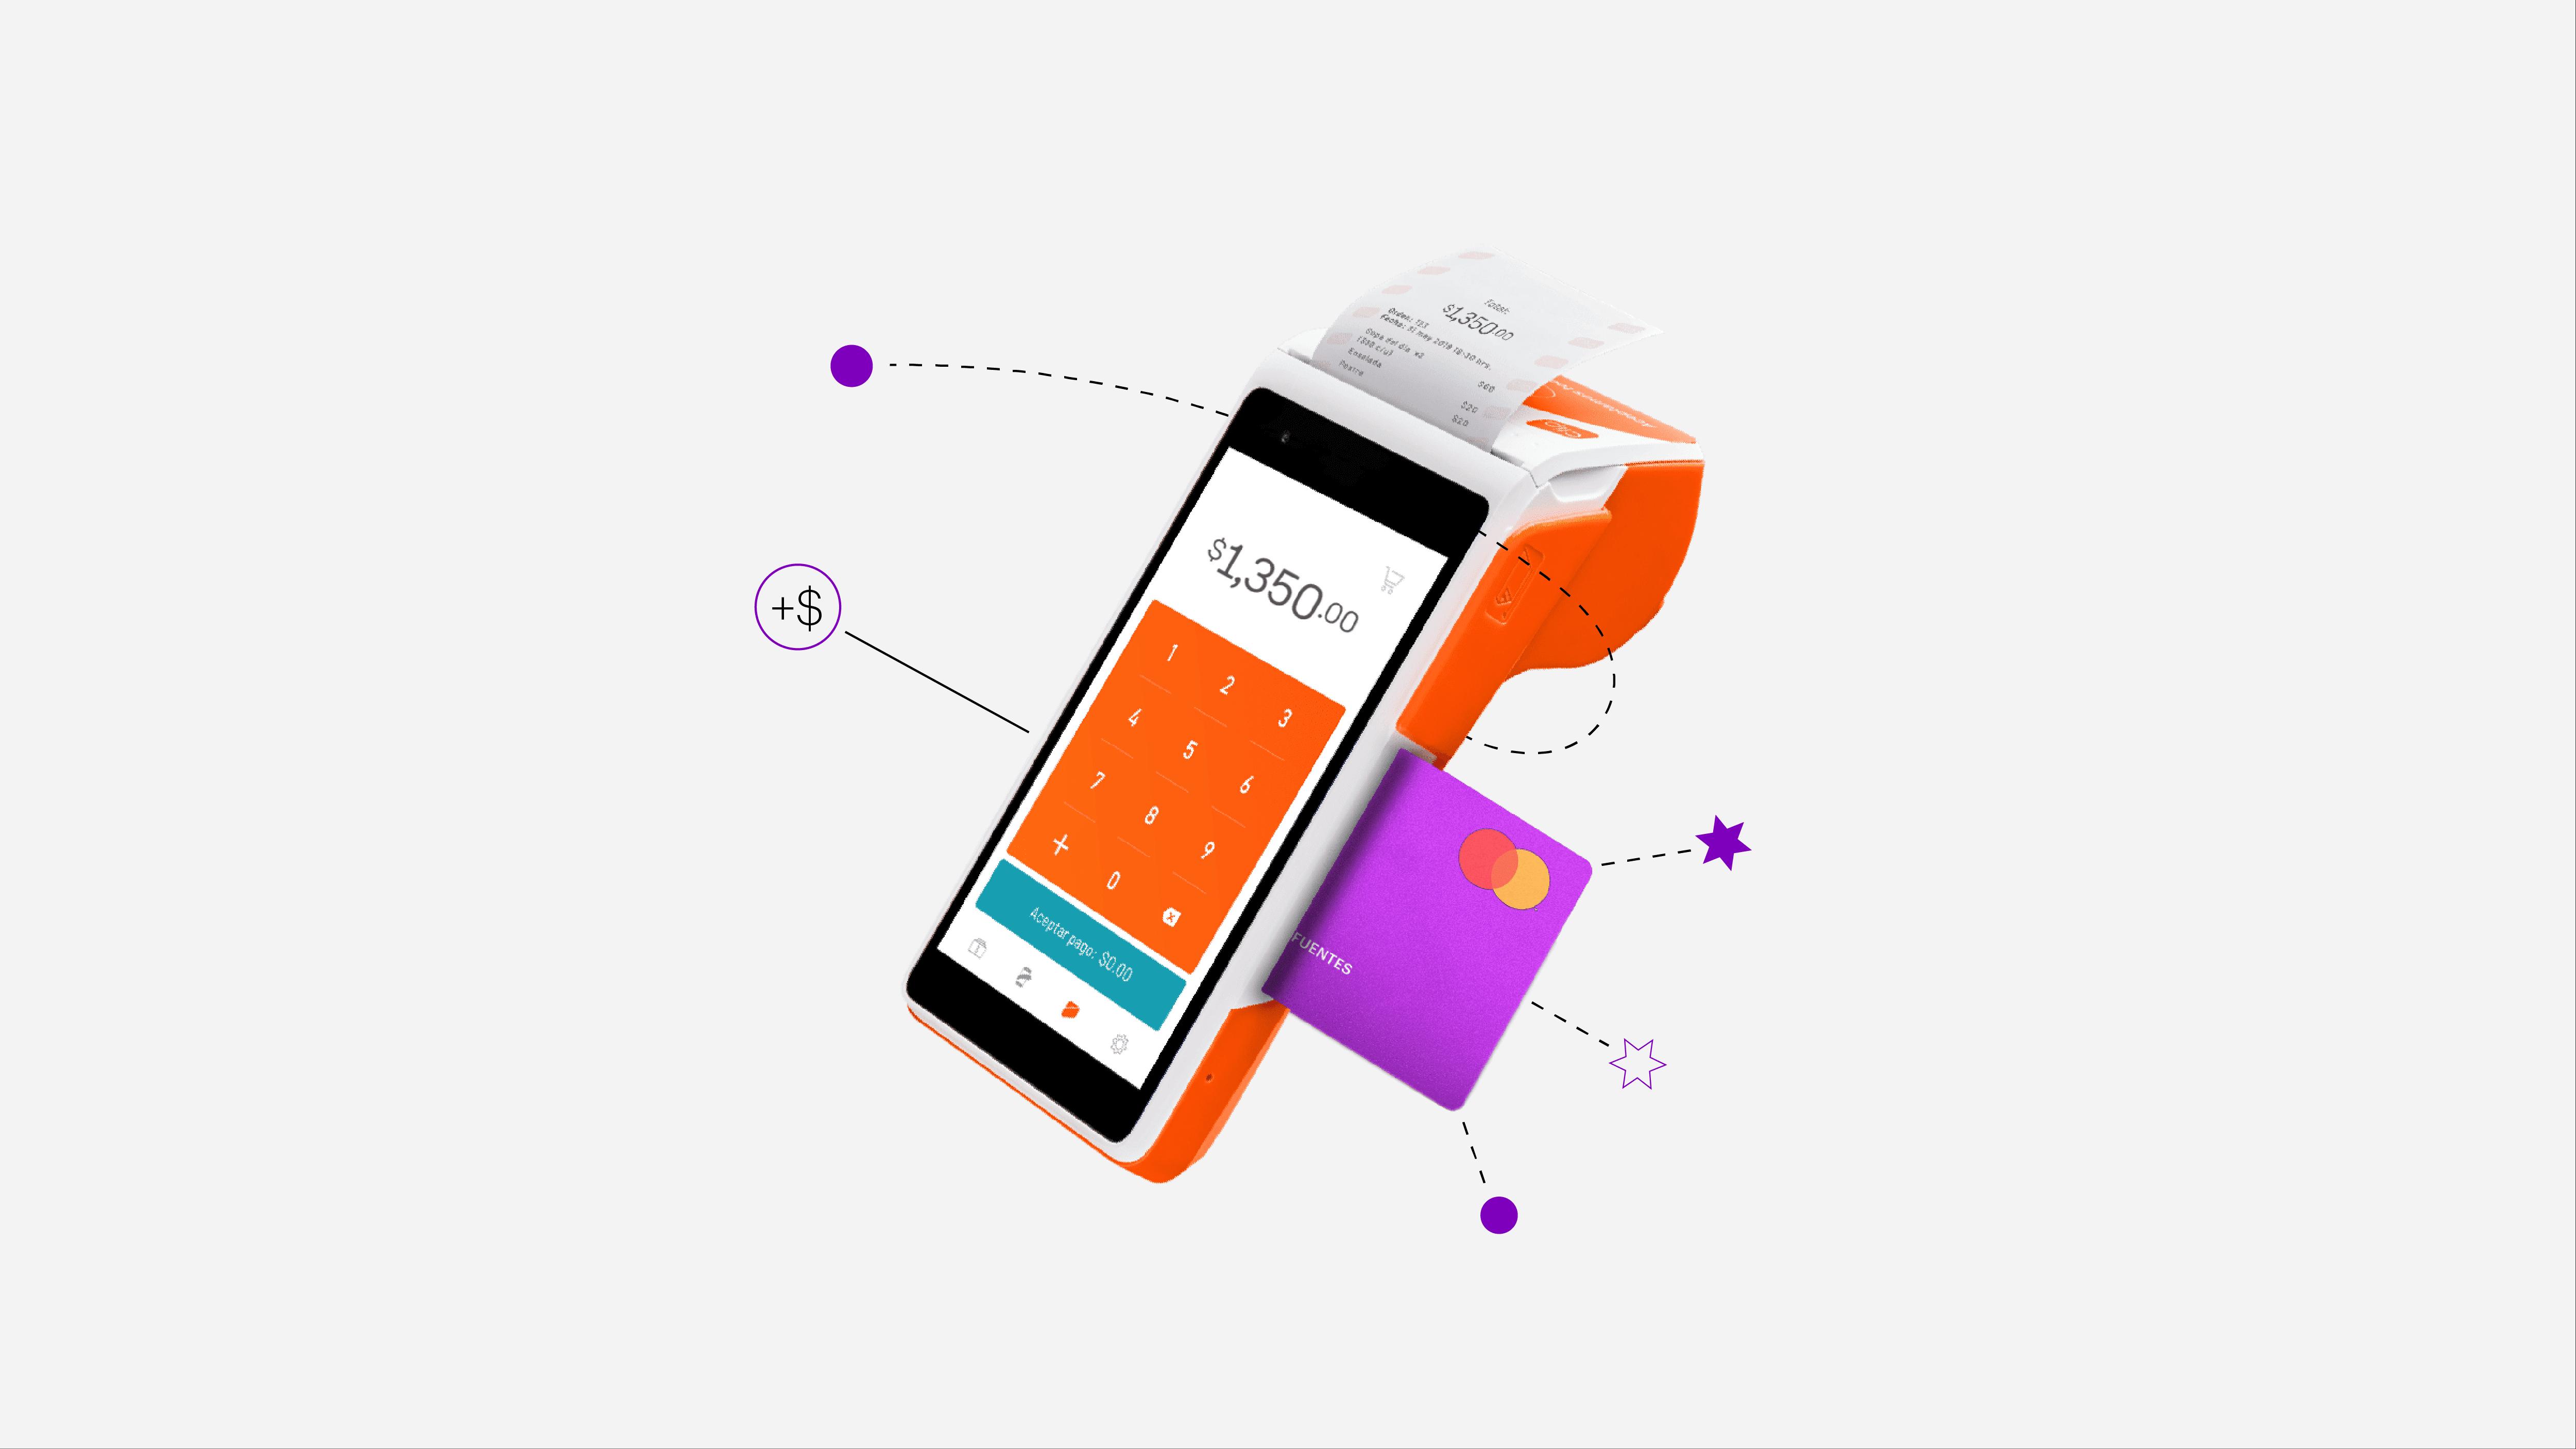 Terminal portátil de cobro Clip con tarjeta de crédito Nu ofrecen Meses Sin Intereses